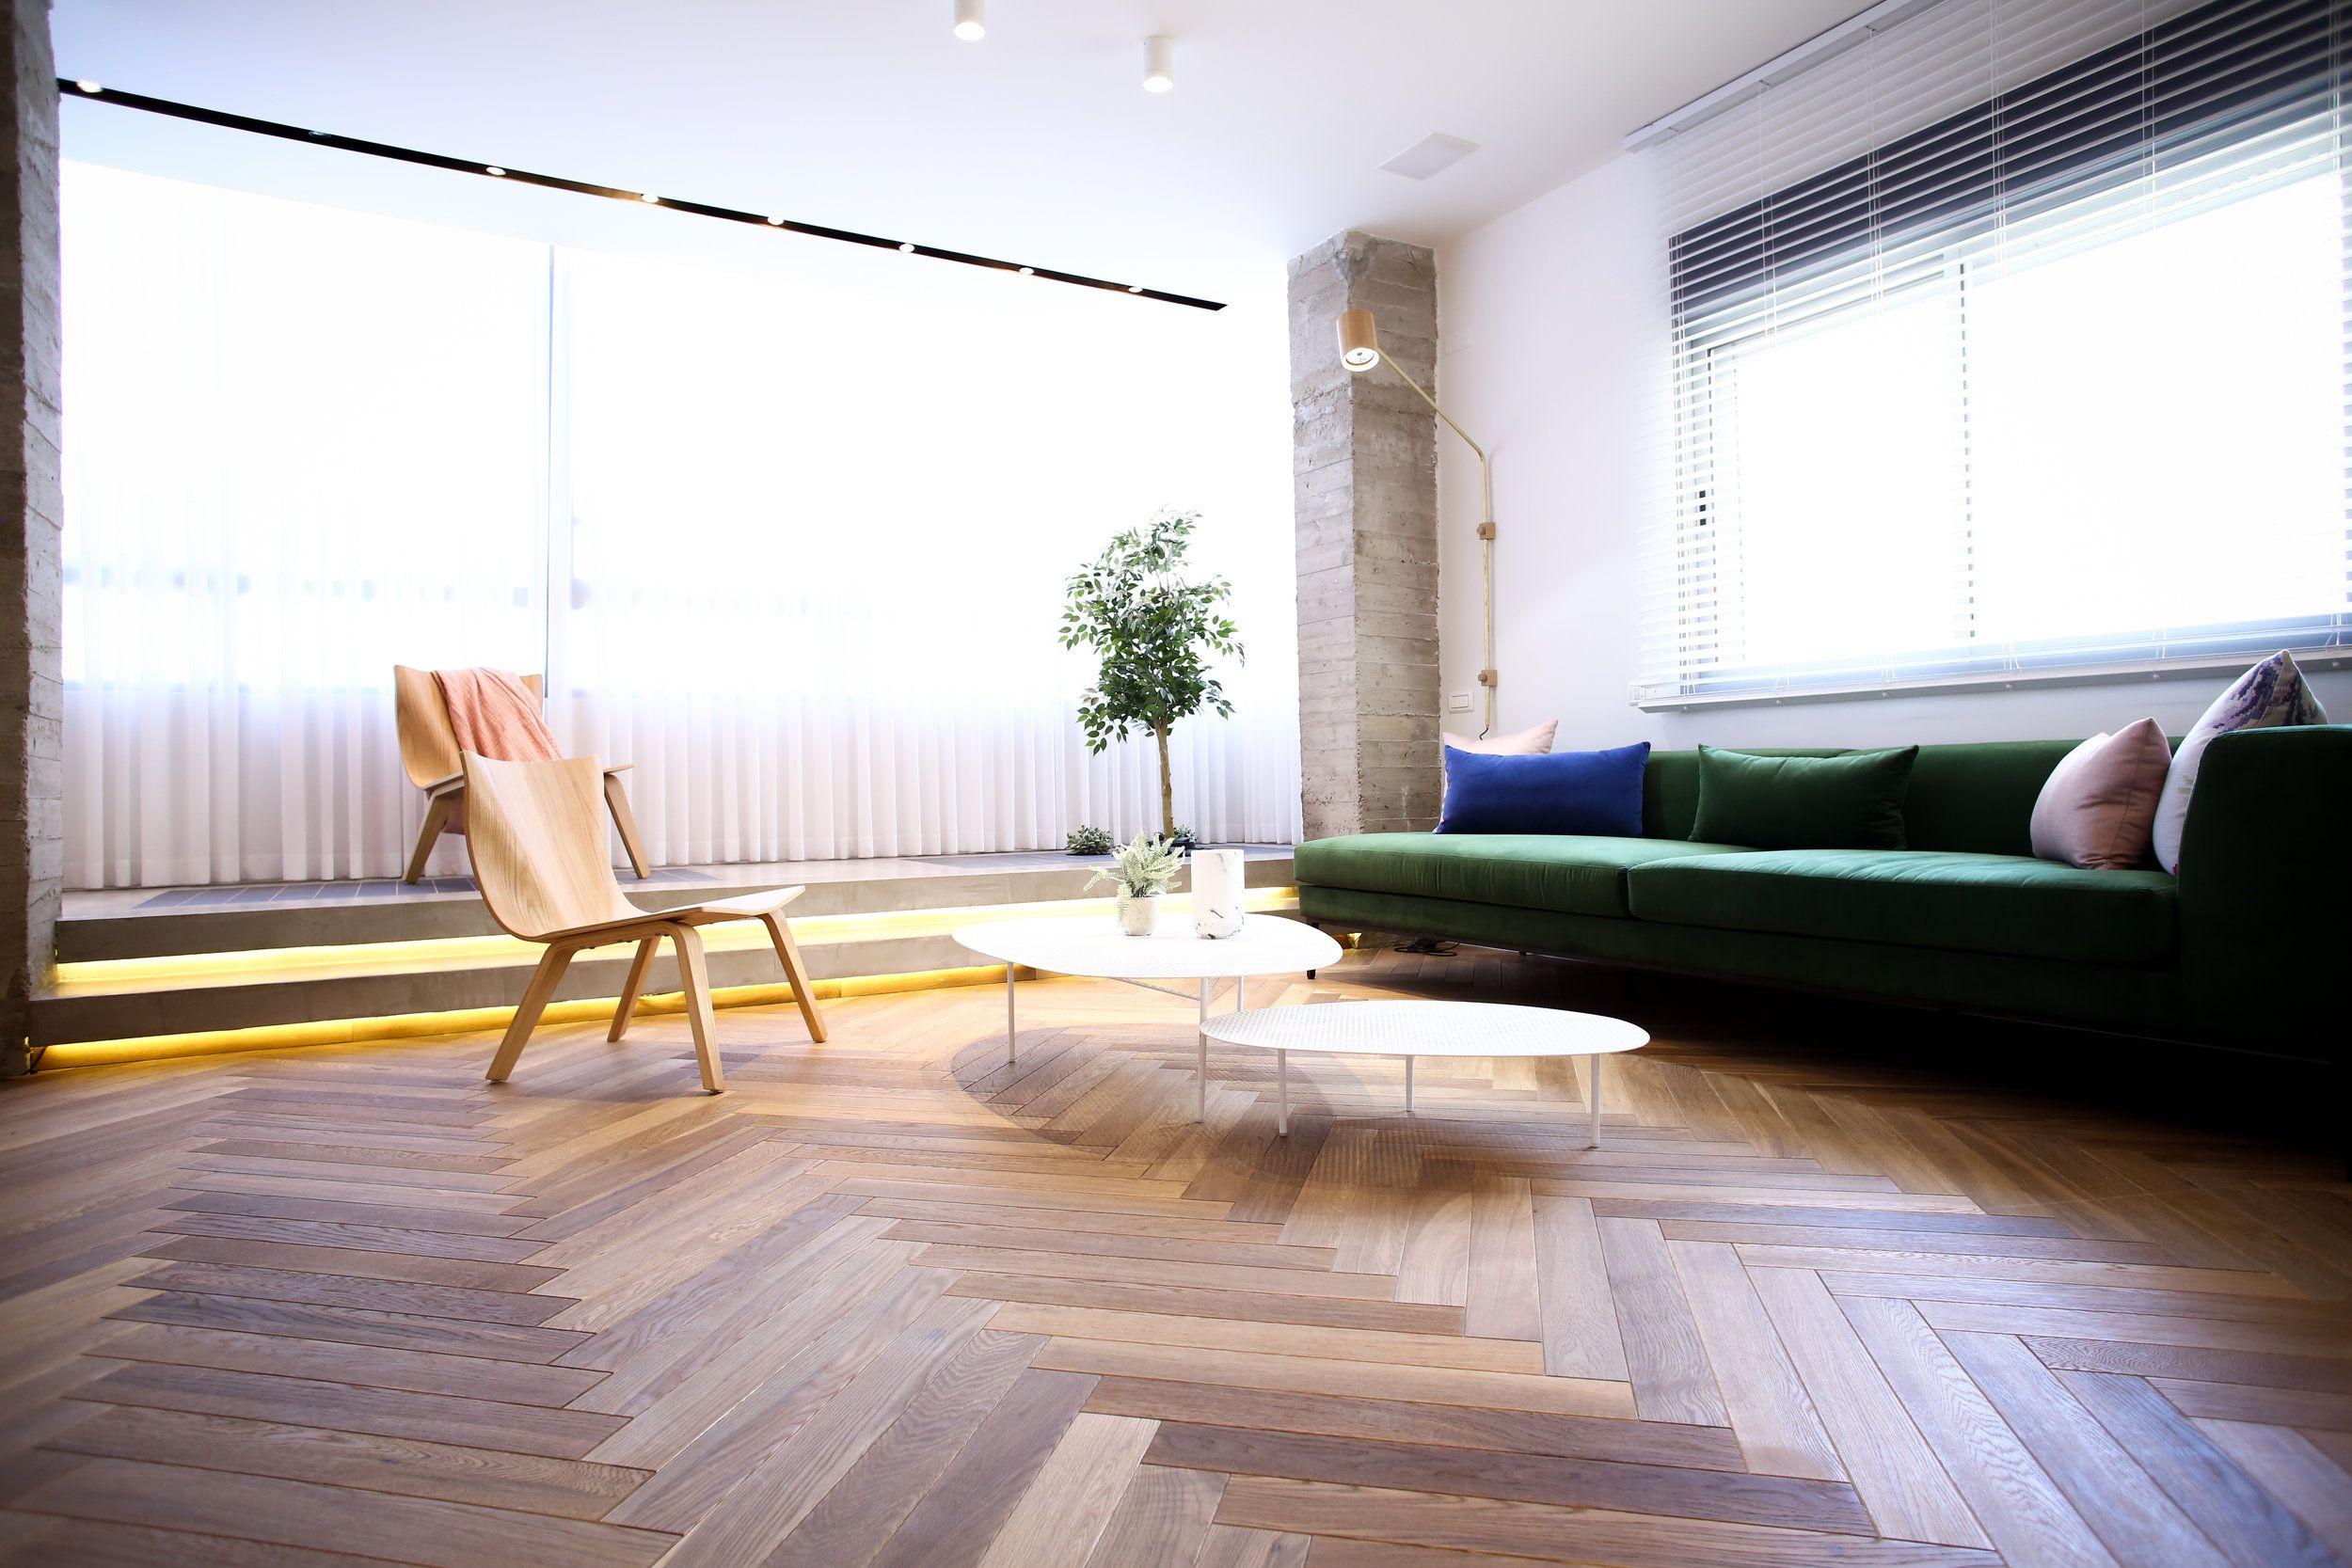 Gordon 2 apartment tel aviv interior design dori redlich photography adi cohen zedek